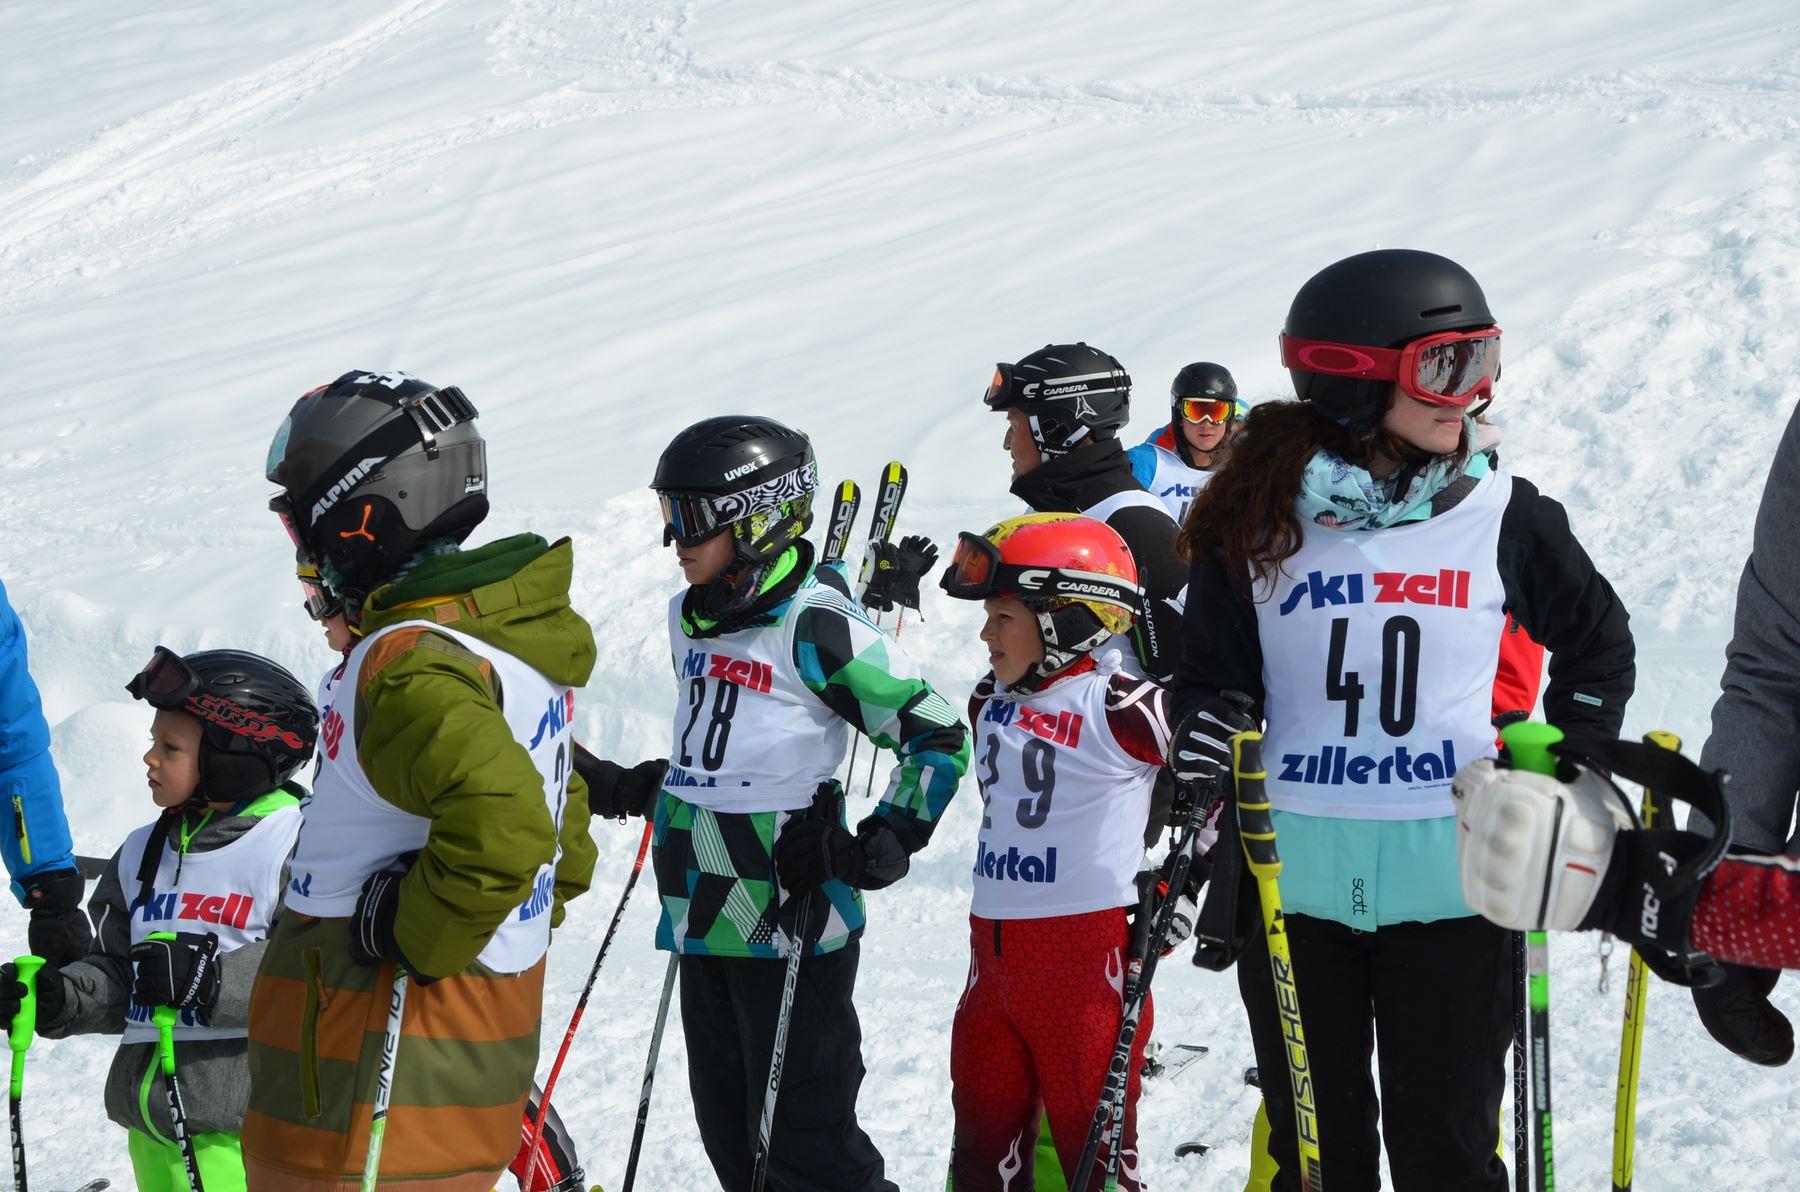 2015-03-22 BV Zillertal Skirennen 109.JPG